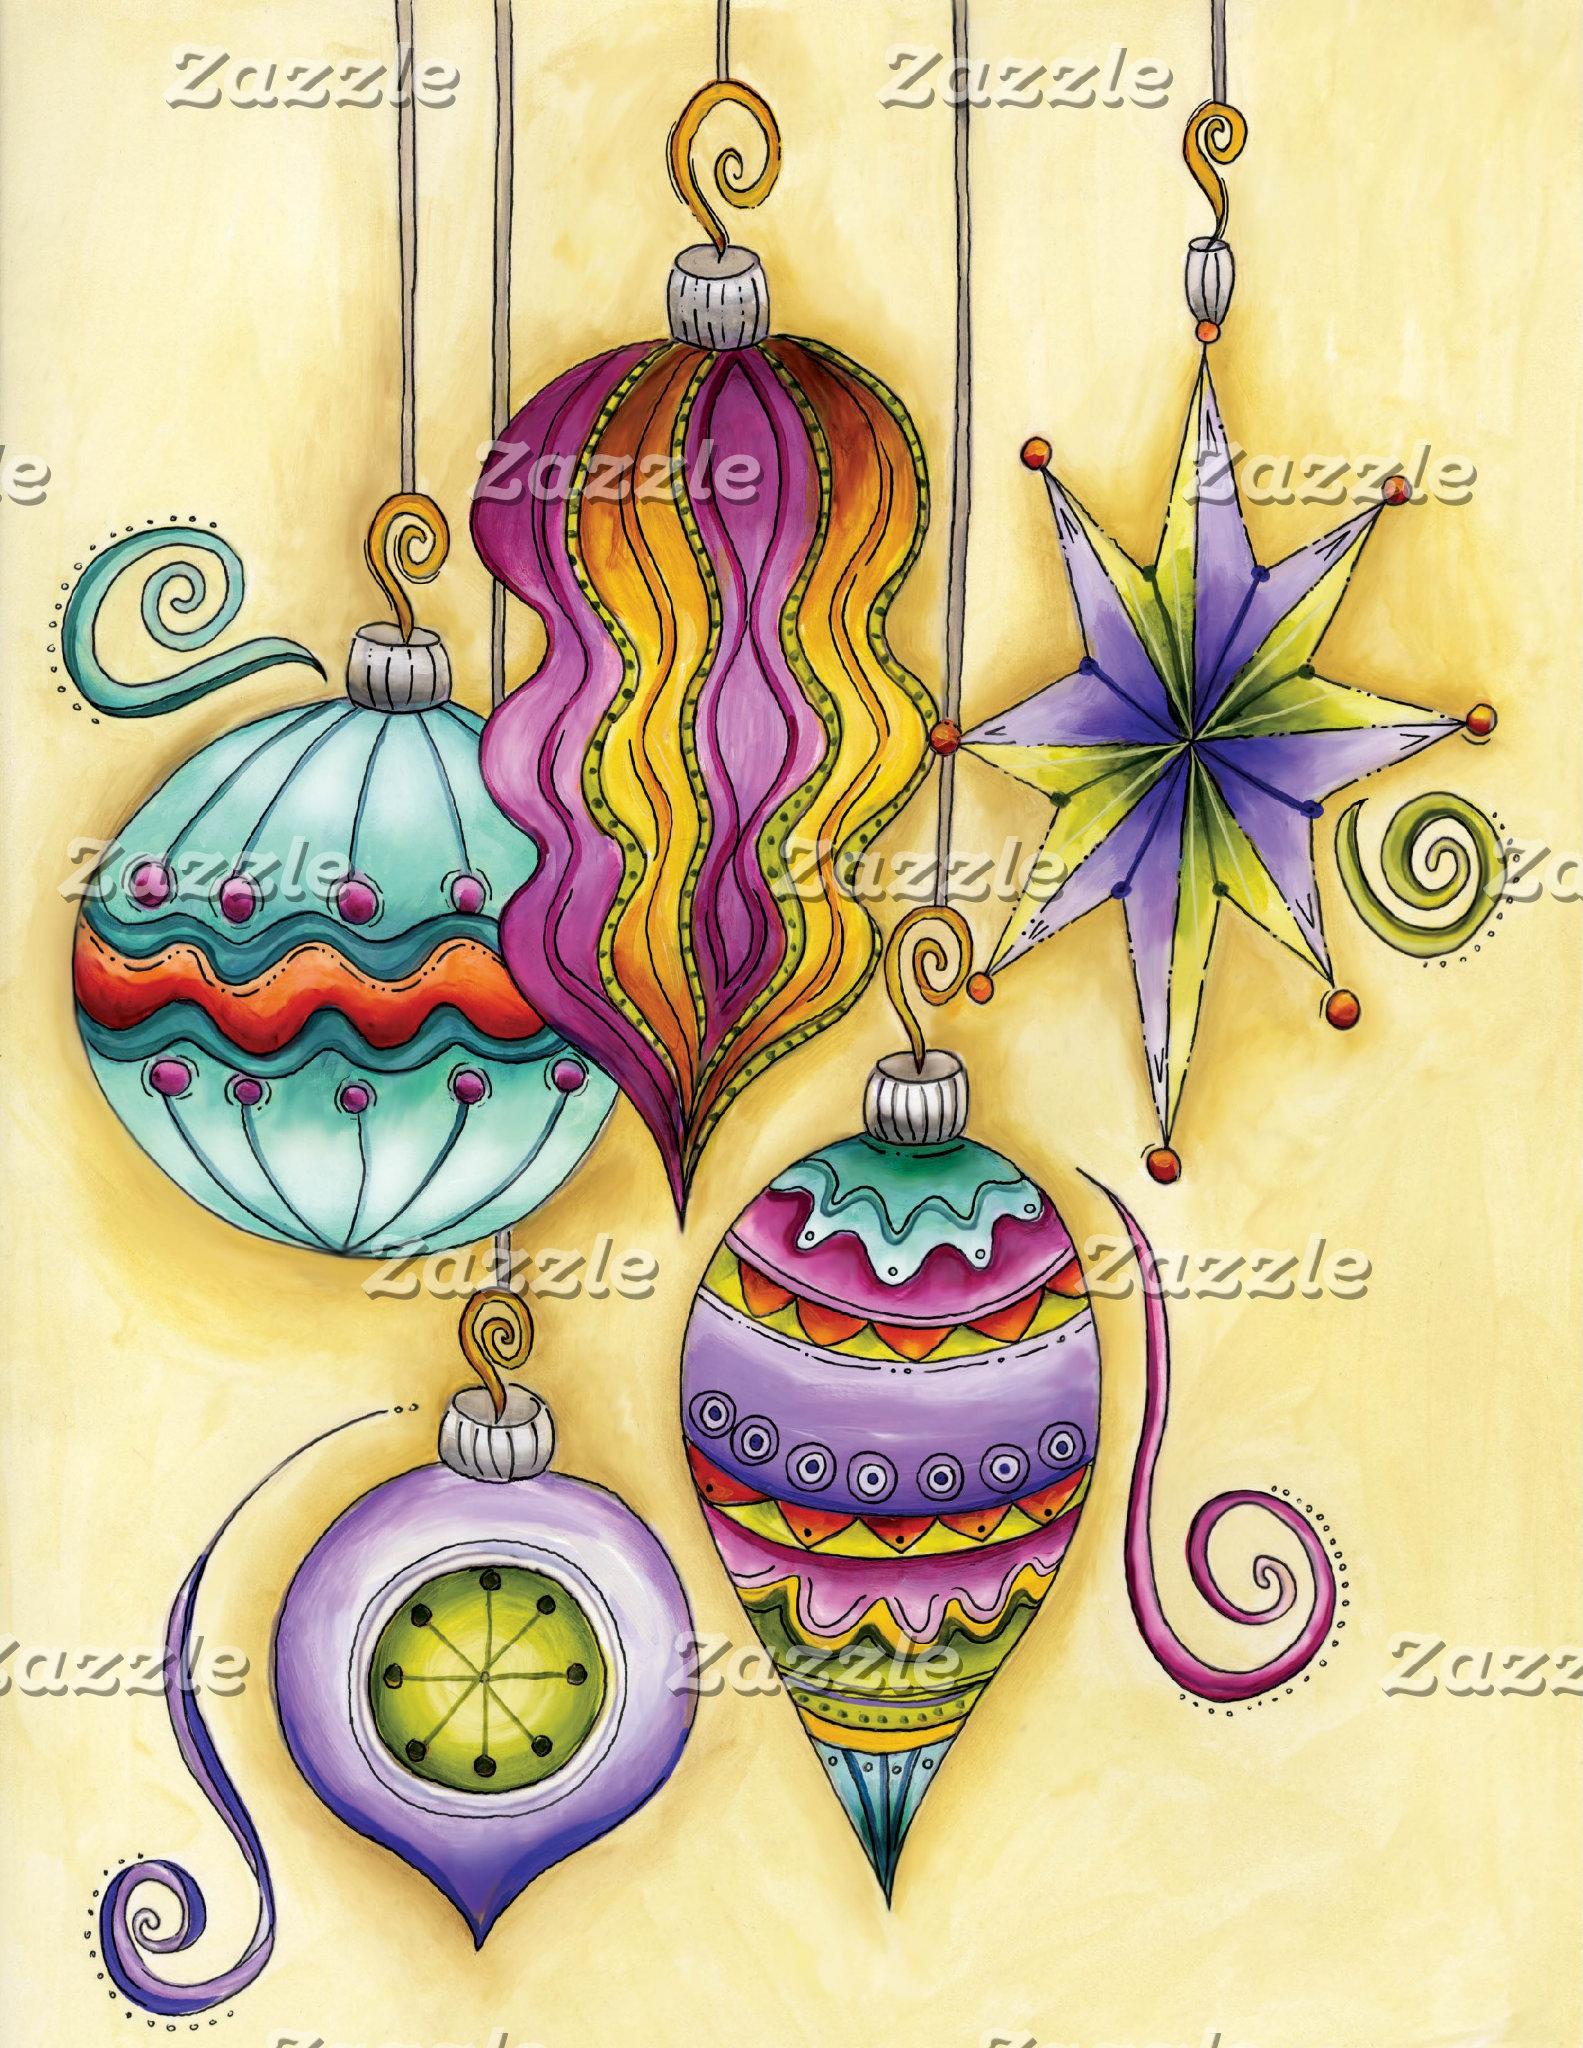 Christmas Symbols and Characters